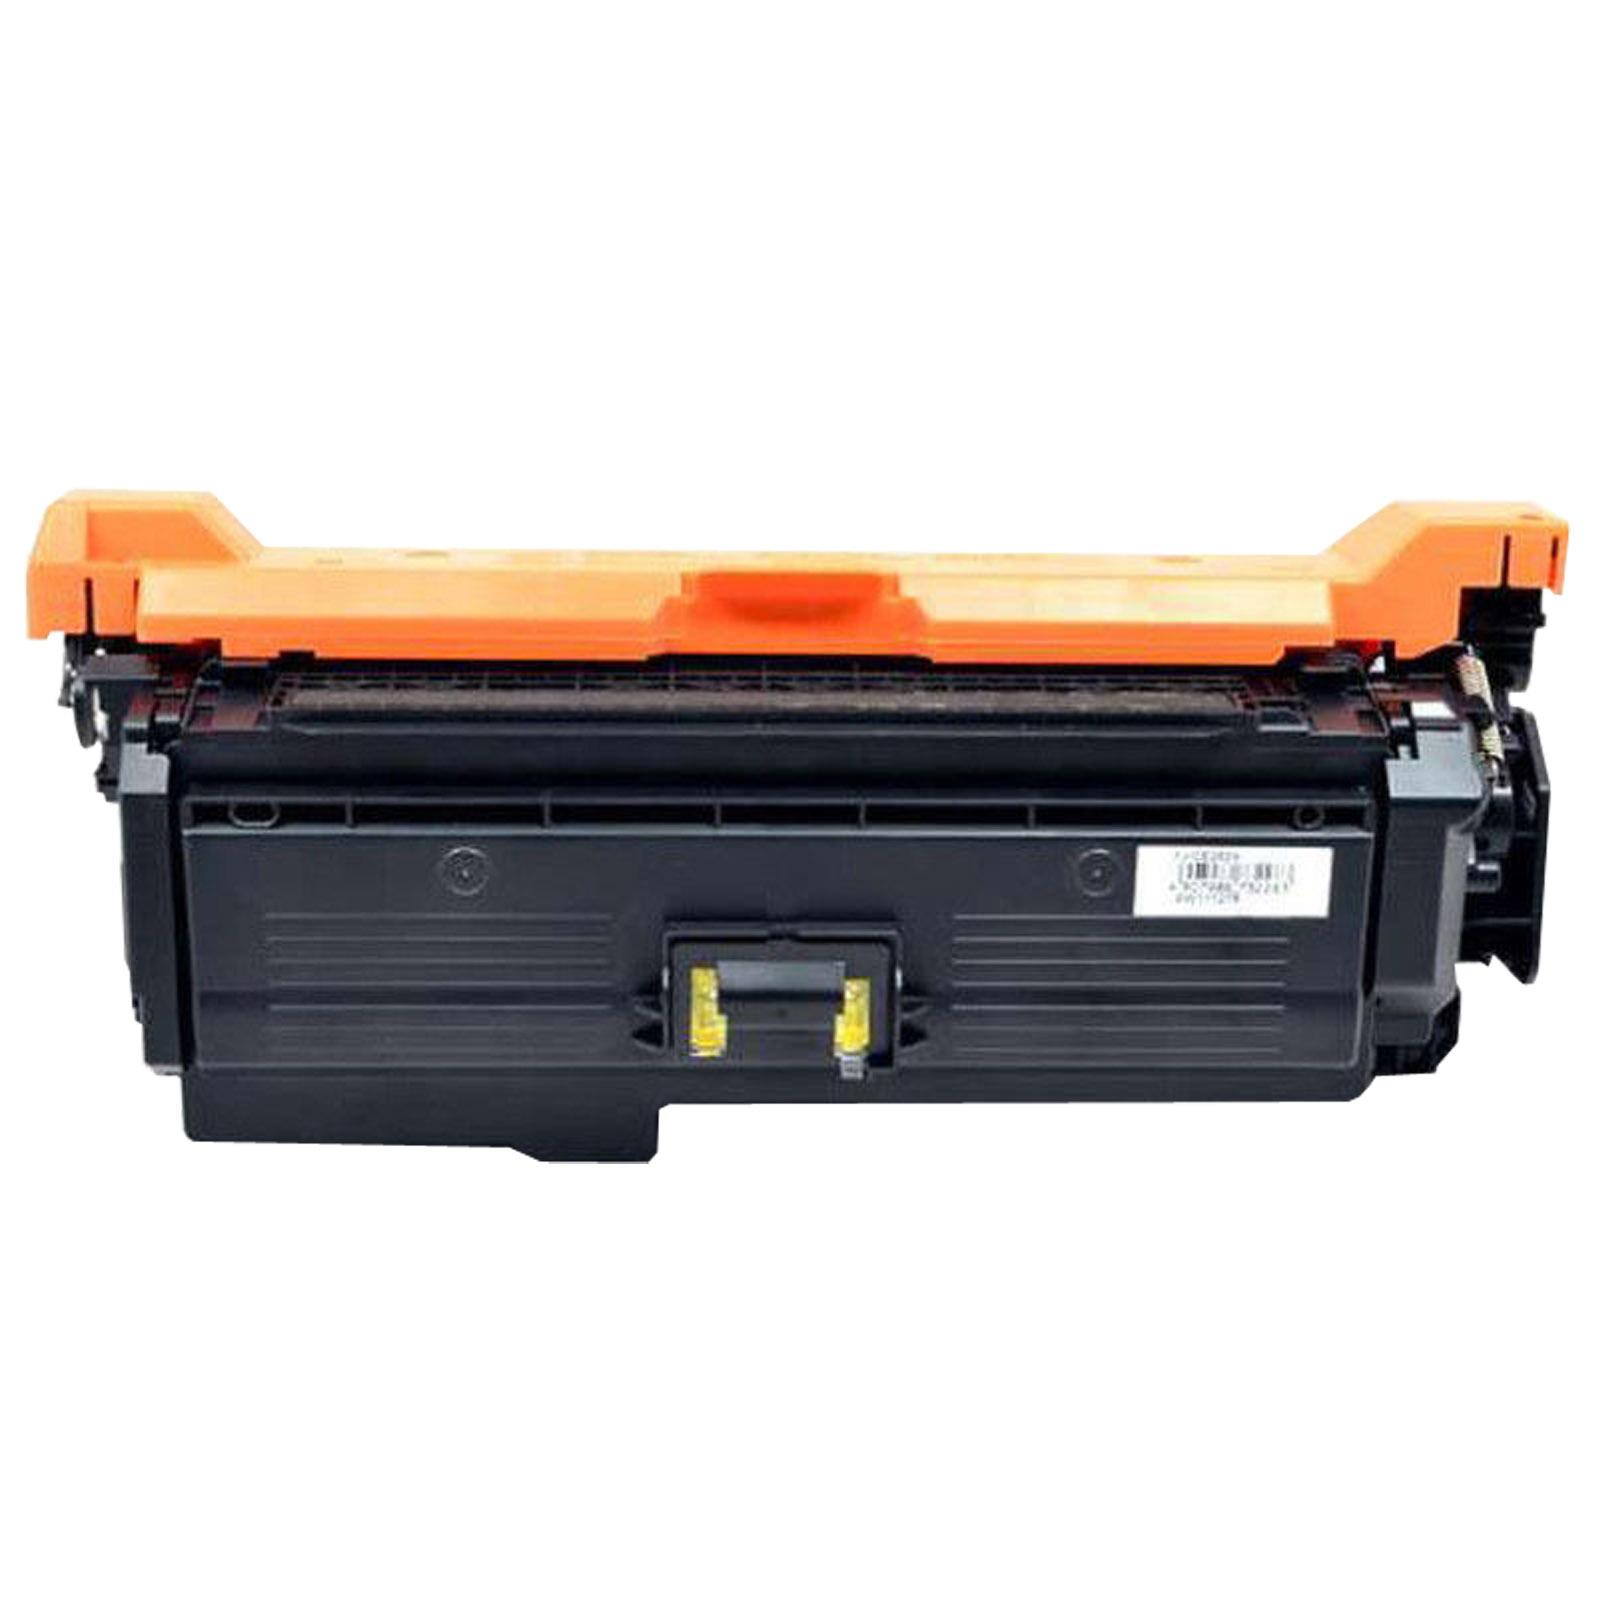 2PK CE262A Yellow Toner Cartridge For HP 647A LaserJet CP4525n CP4025n CP4525dn